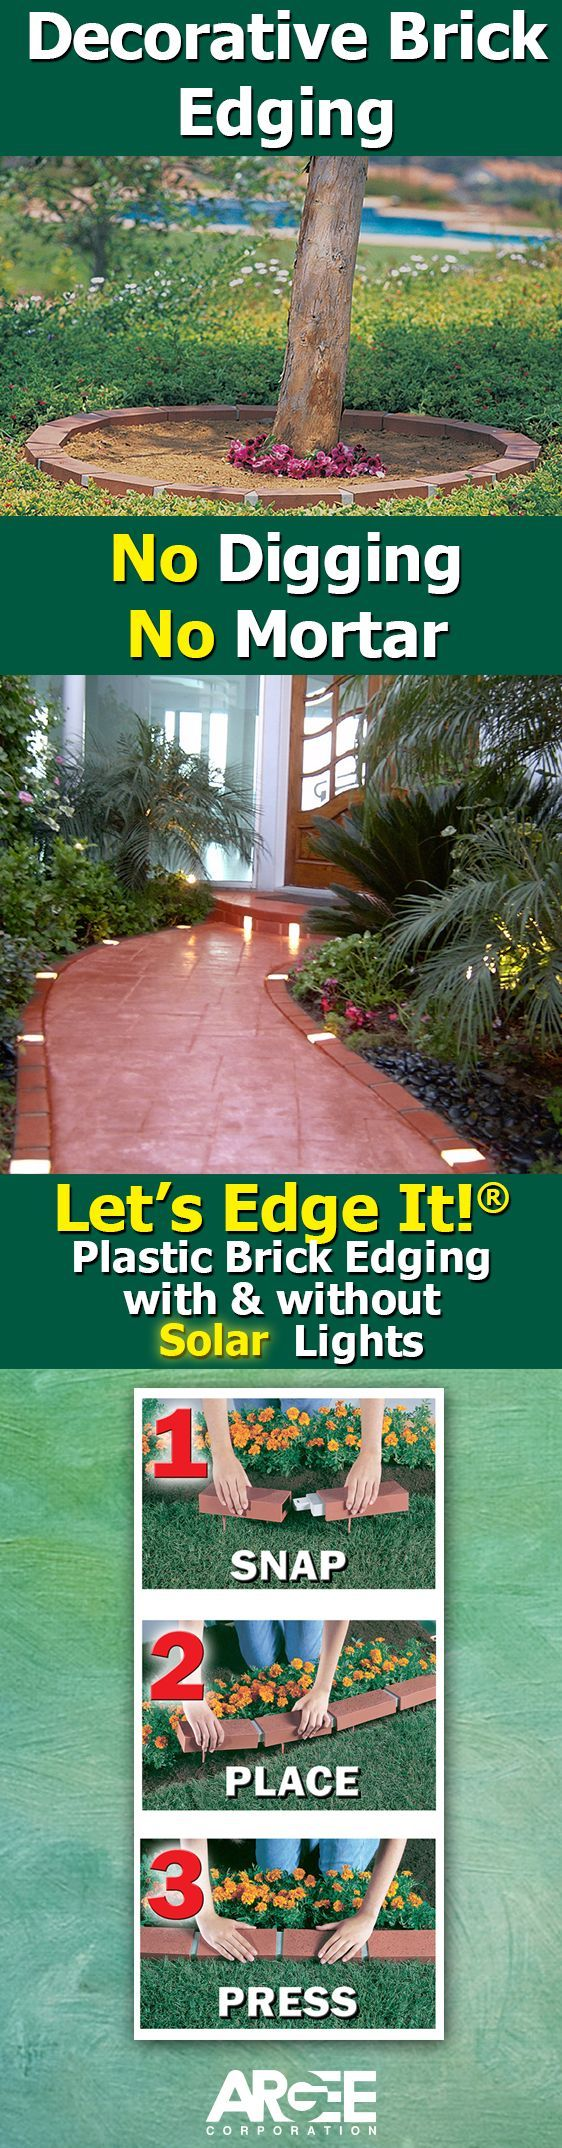 Letu0027s Edge It!® Decorative Plastic Brick Edging With Solar Lights Installs  In Minutes. Nice Look